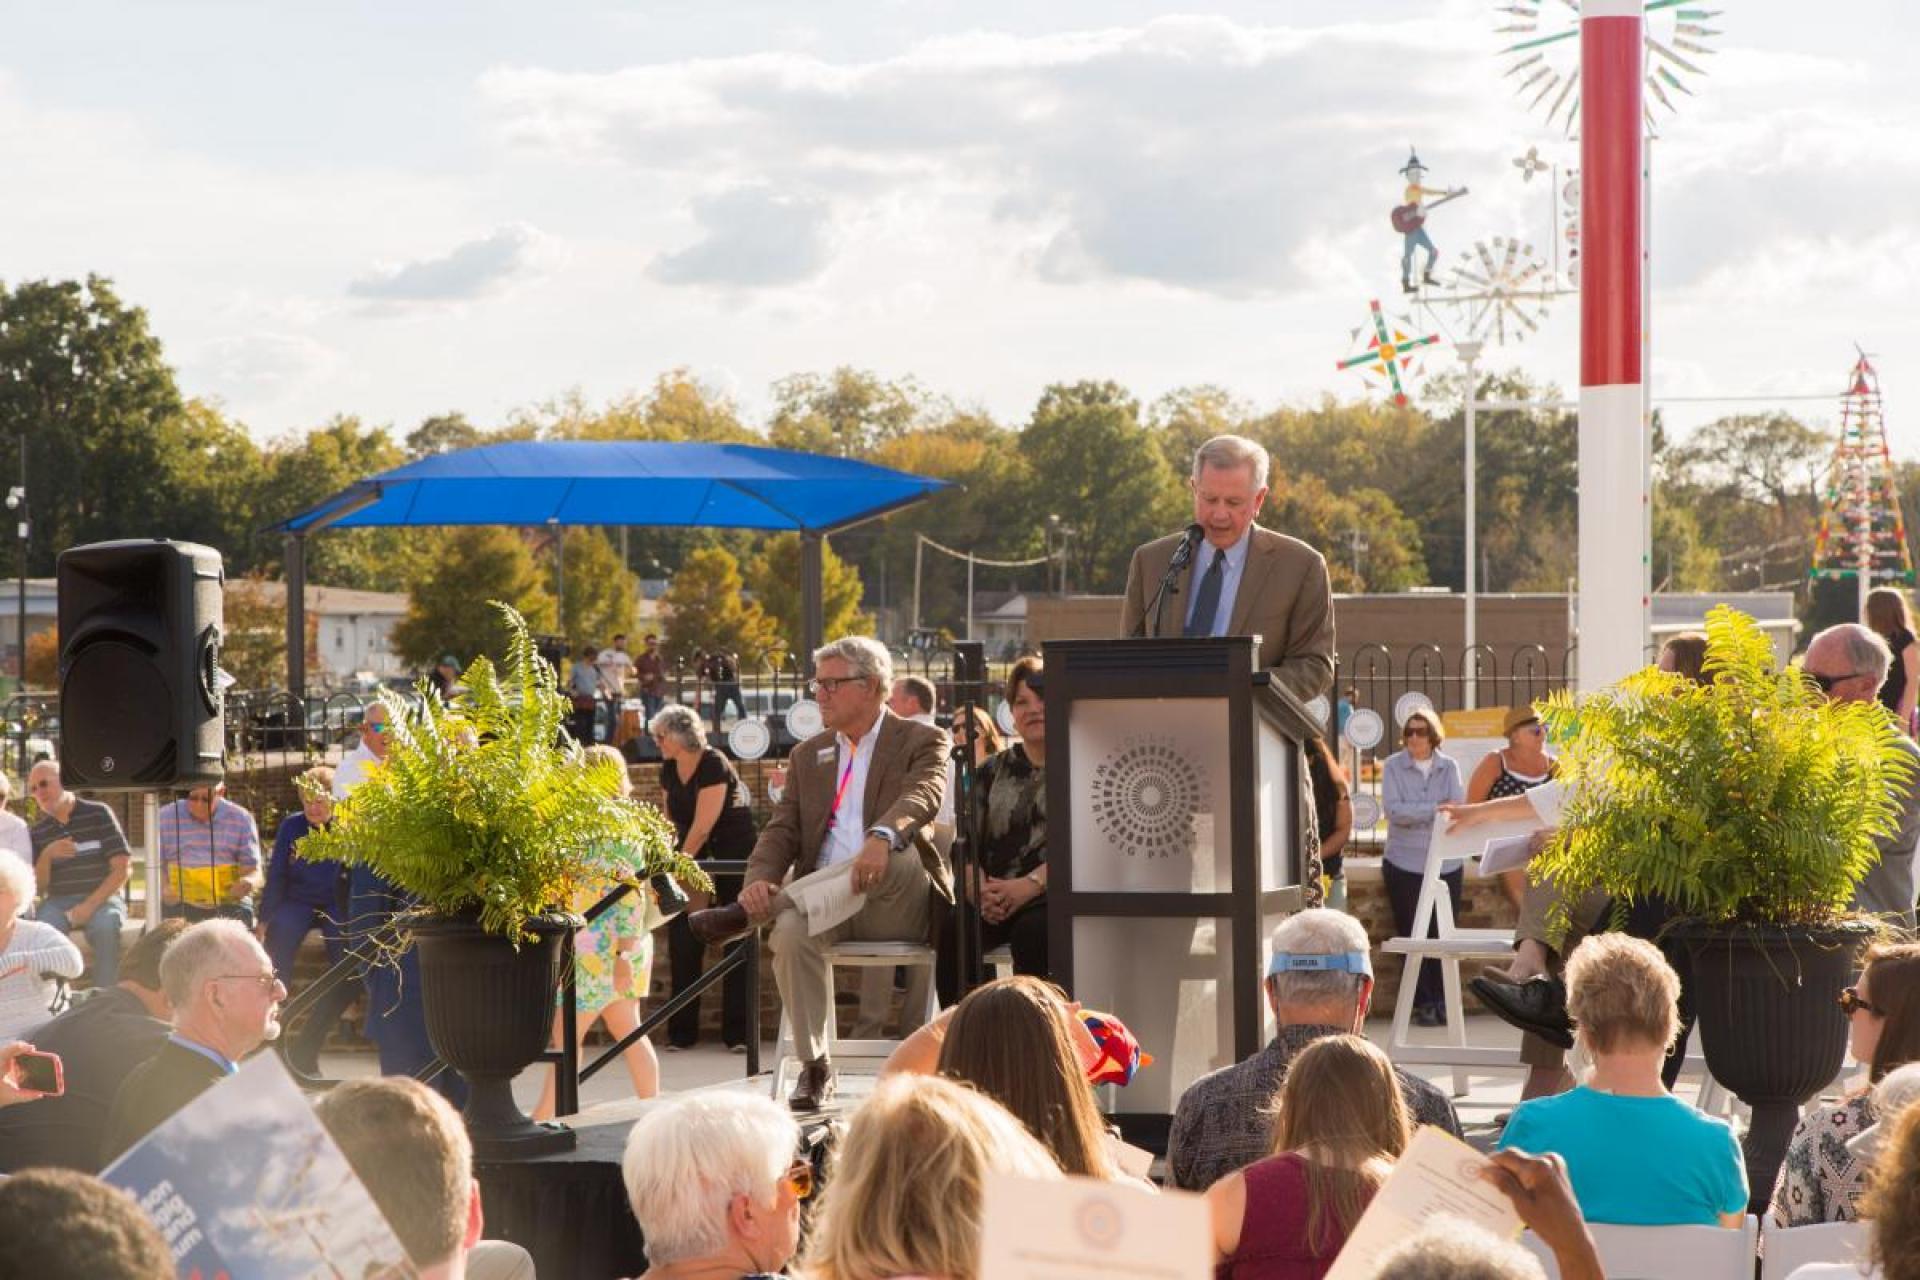 Wayne Martin speaking at the Vollis Simpson Whirligig Park grand opening in Wilson